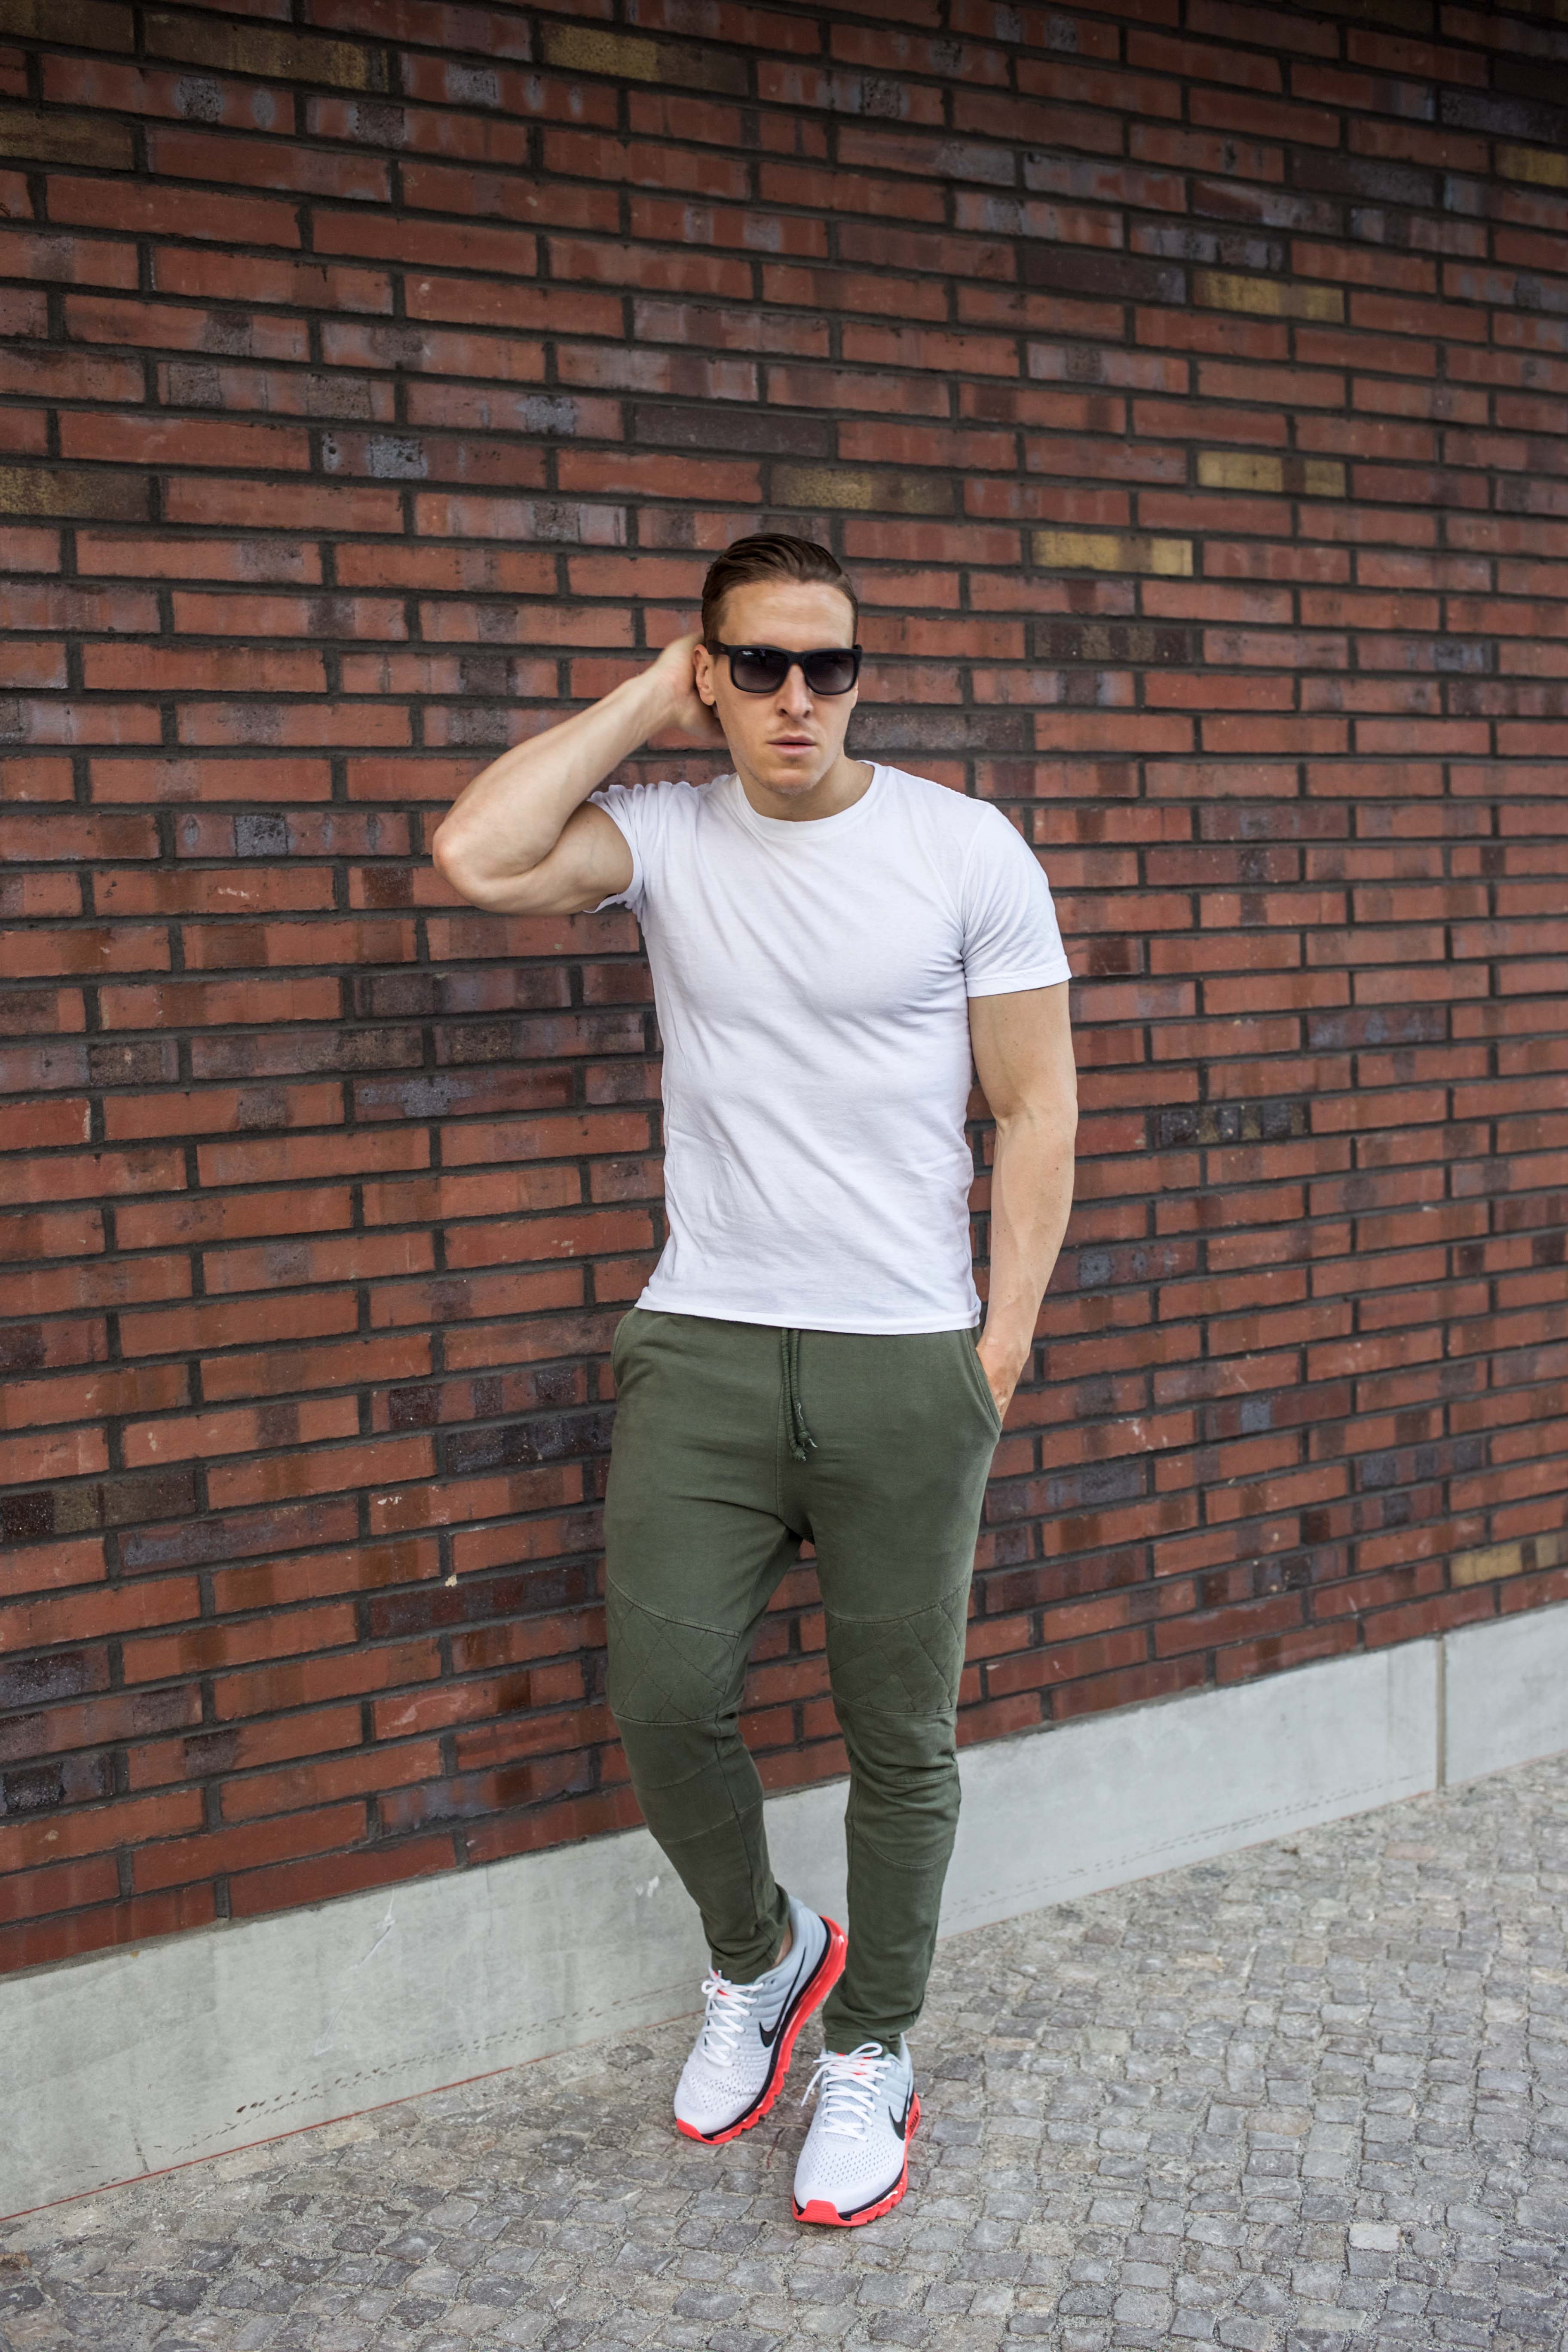 nike-air-max-2017-berlin-outfit-modeblog-lässiger-street-style-männerblog_6541